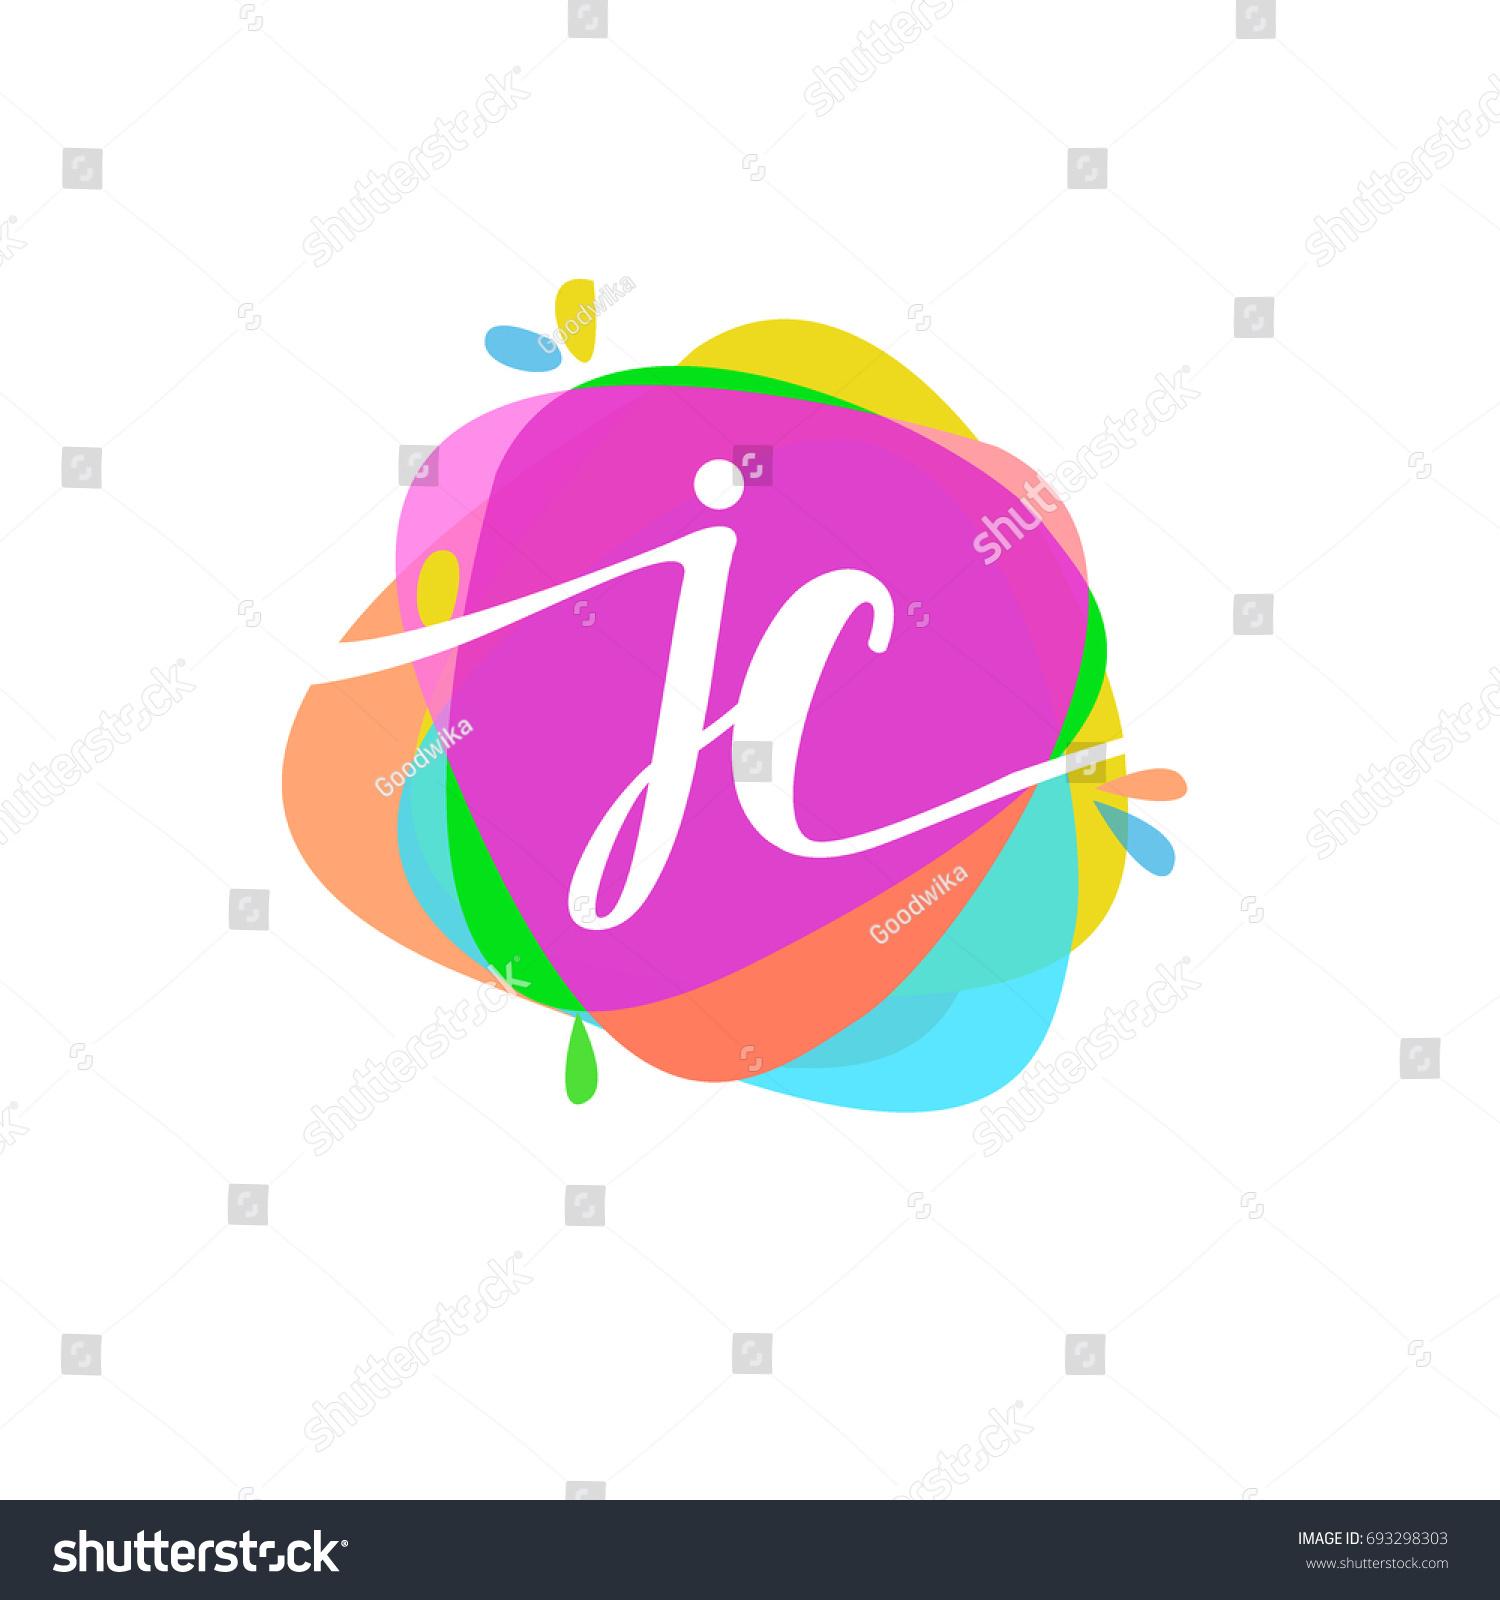 Letter JC Logo Colorful Splash Background Stock Vector (Royalty Free ...